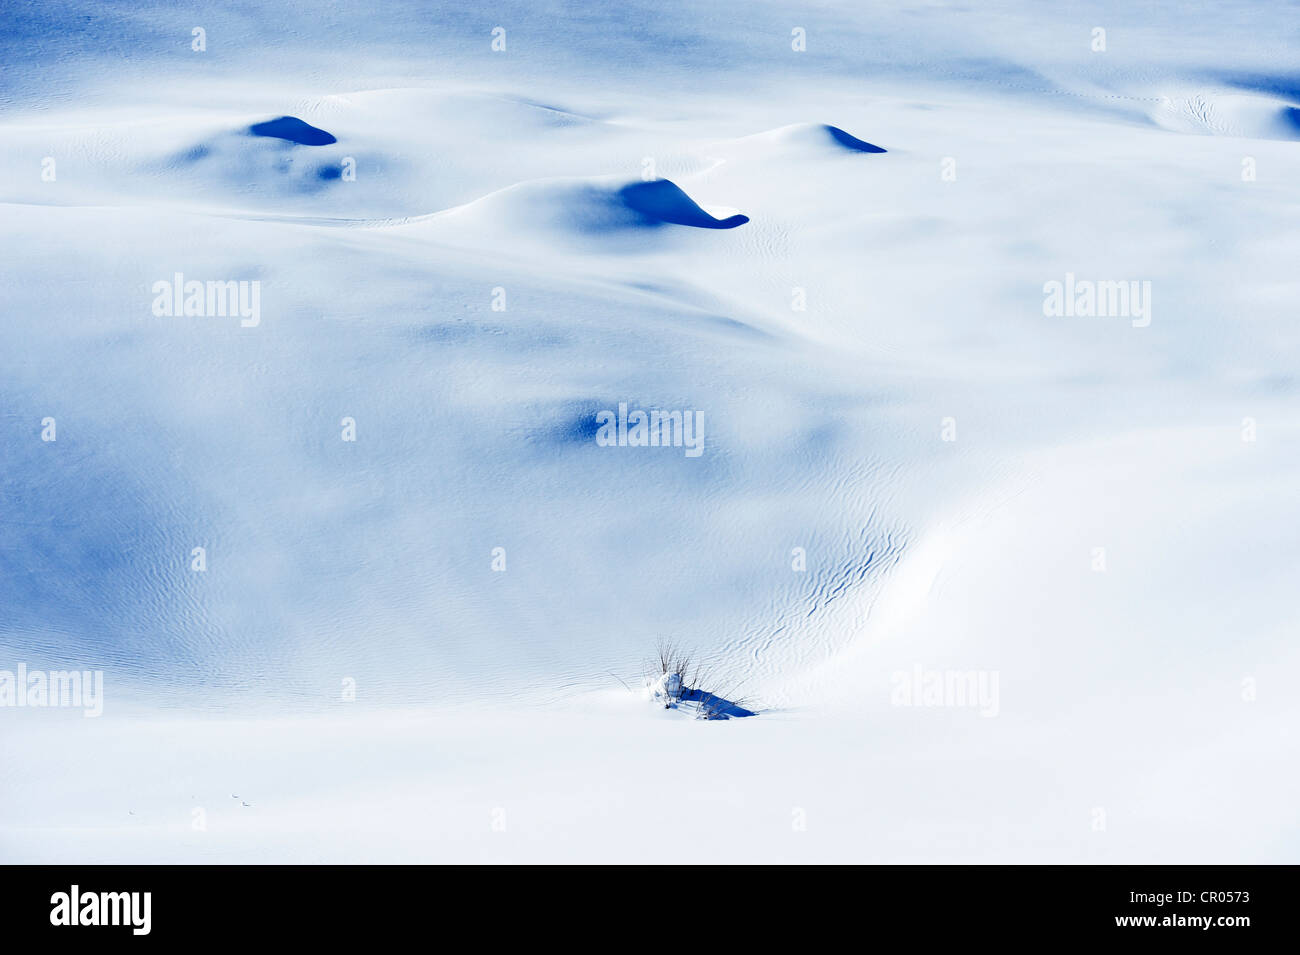 Snowdrift on Lake Truebsee near Engelberg, Obwalden, Switzerland, Europe - Stock Image